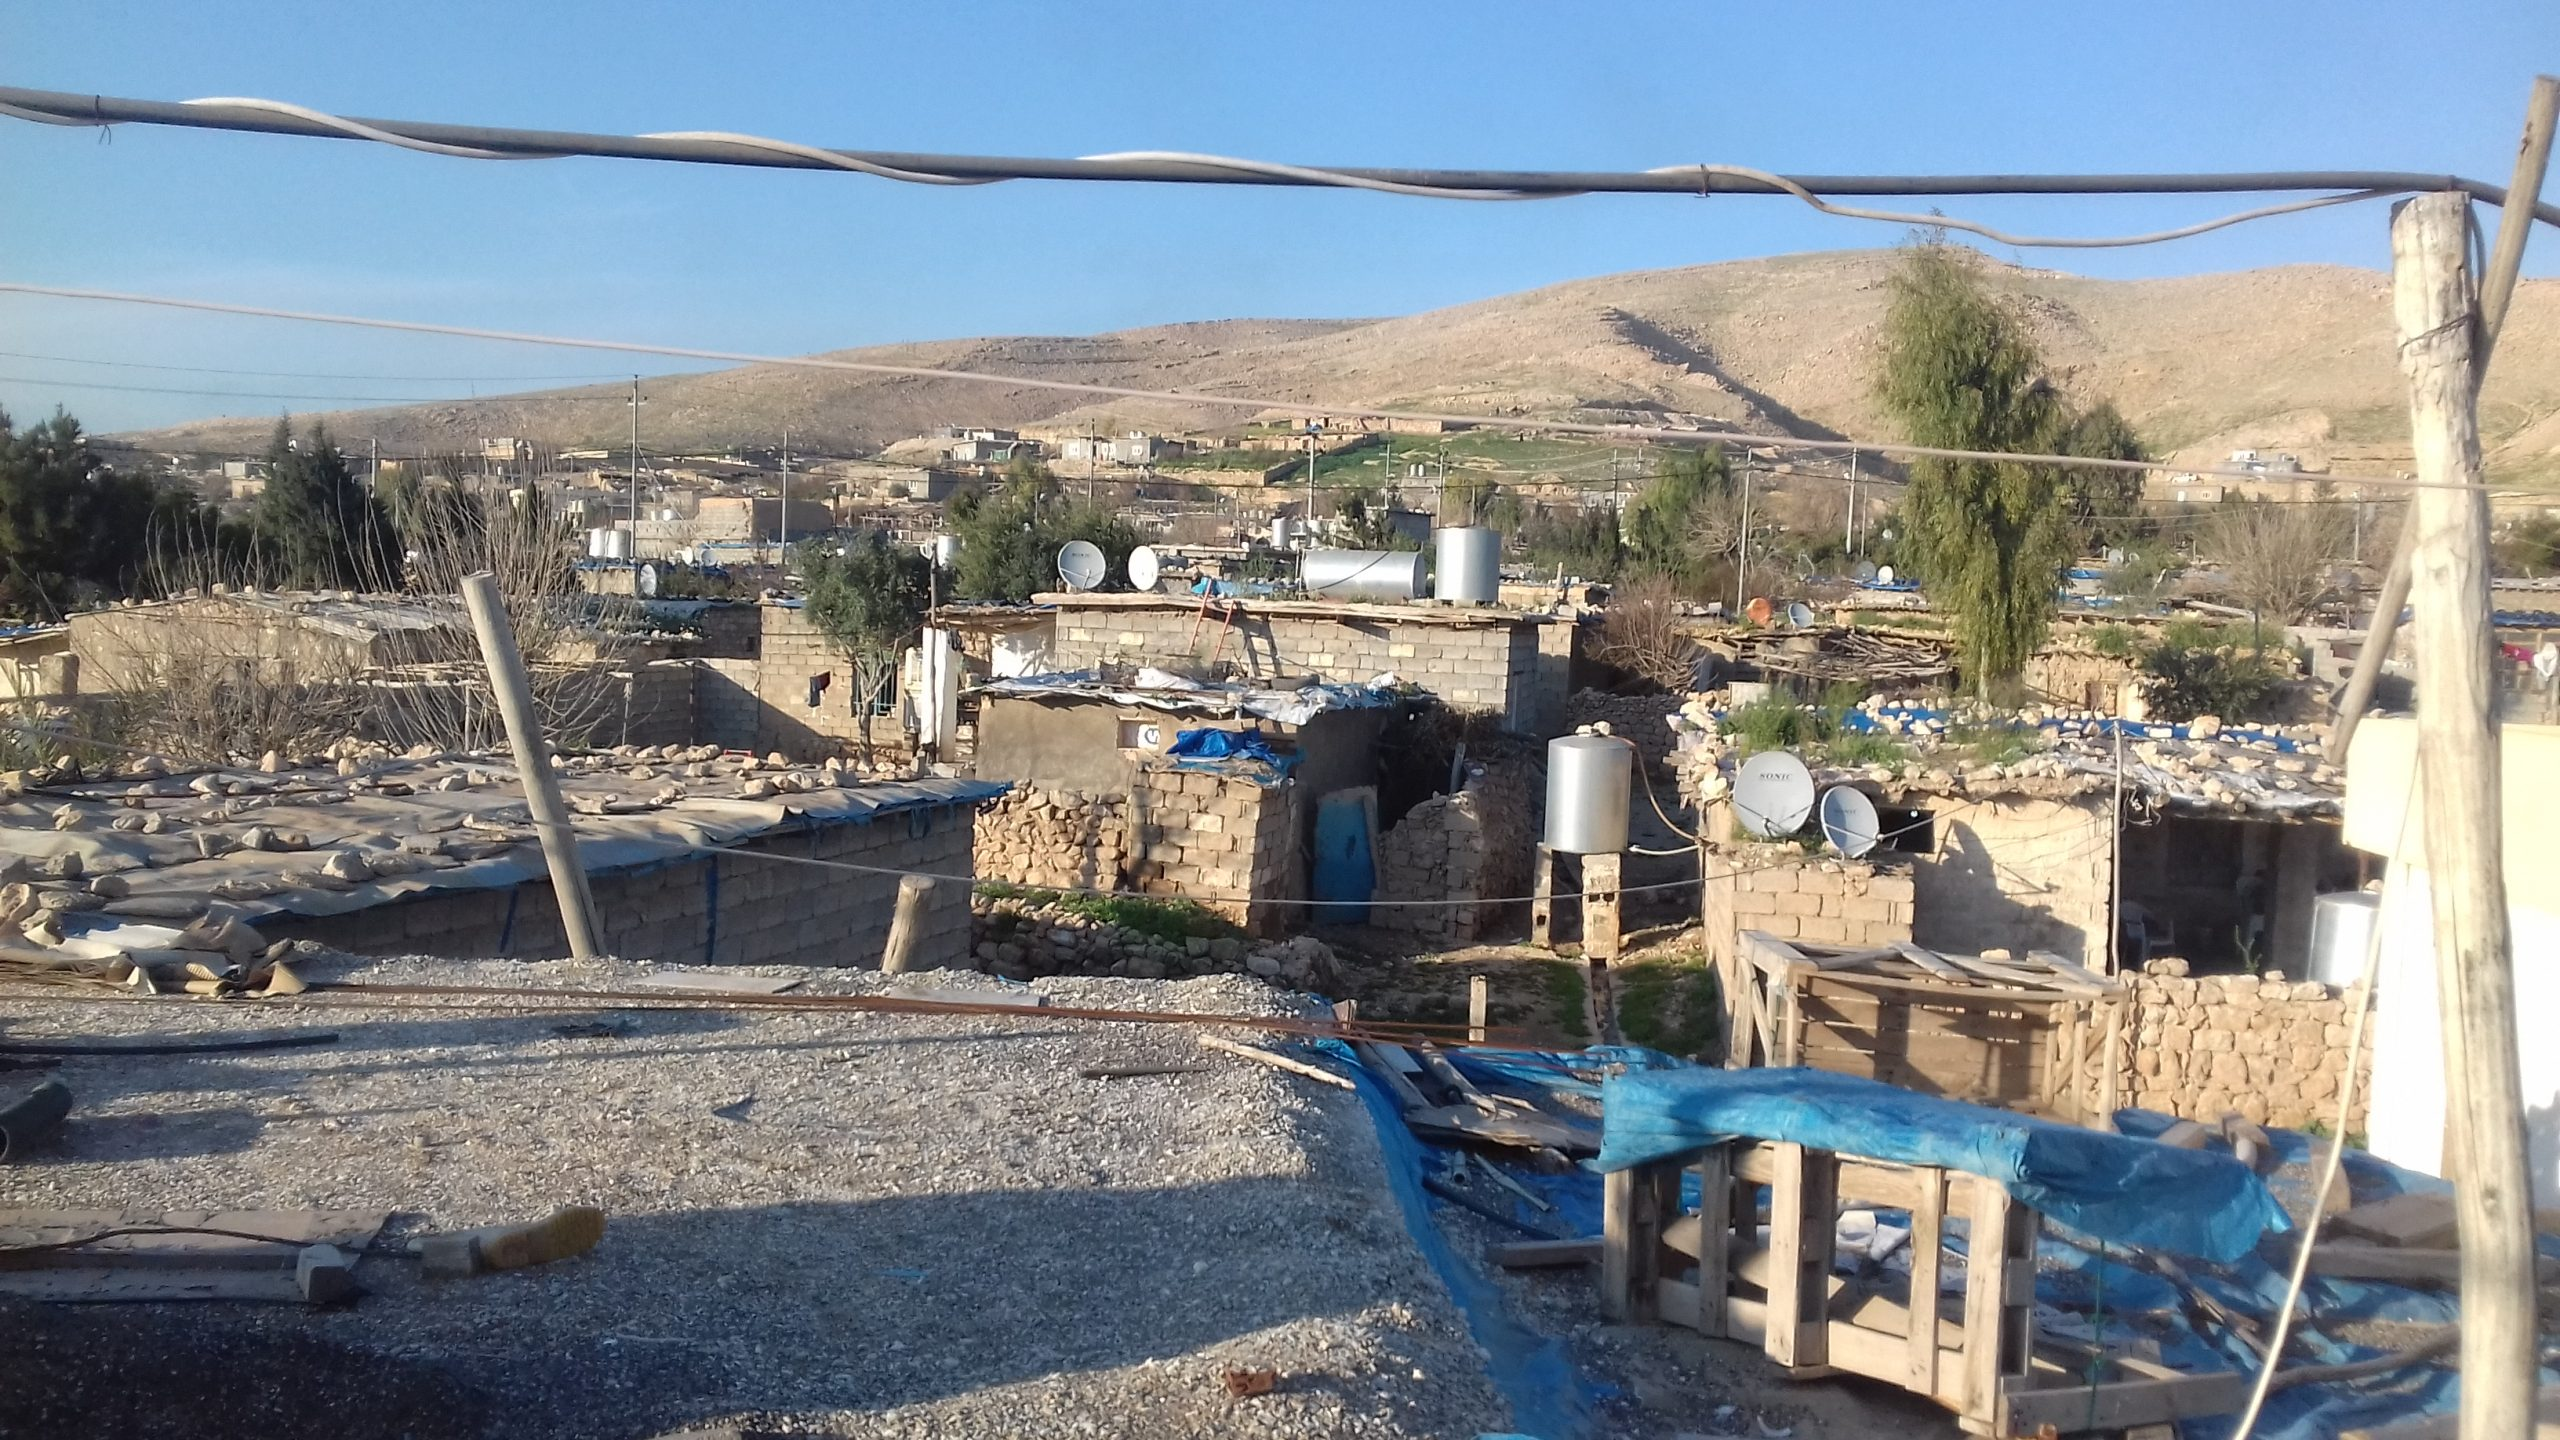 campo profughi kurdo, marzo 2019